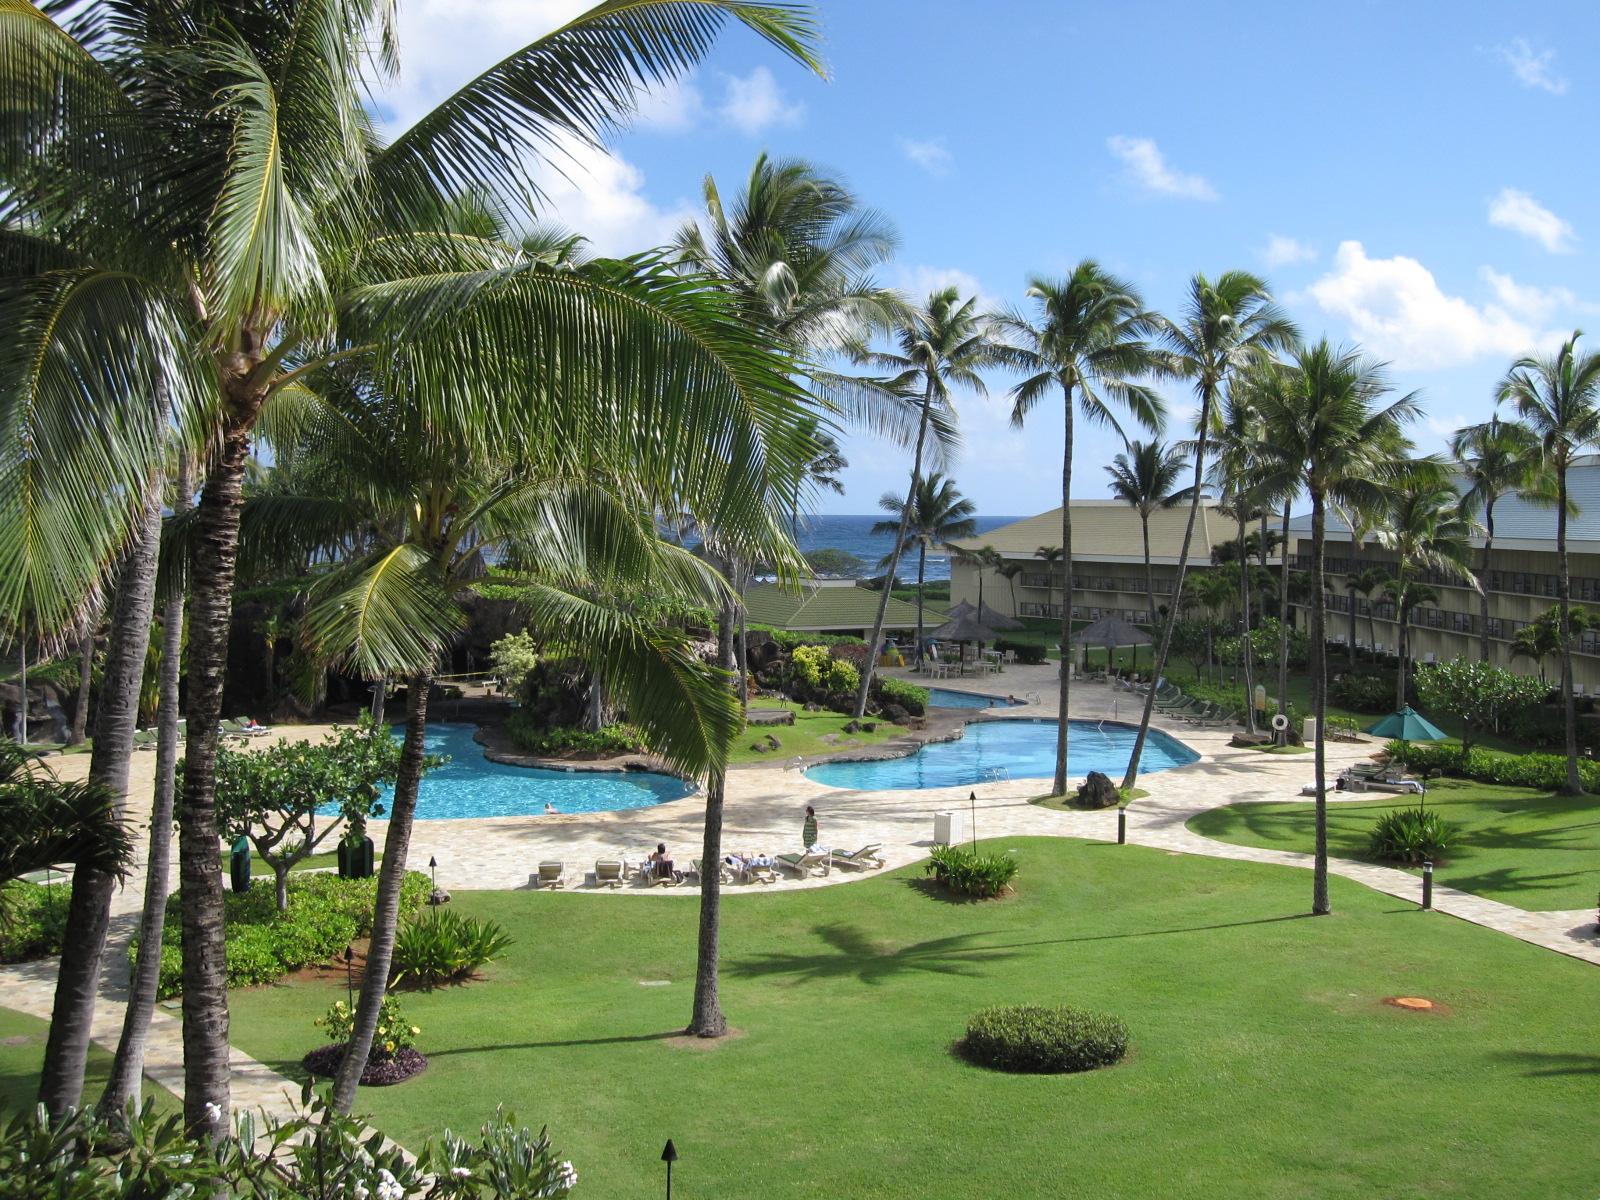 Kauai Real Estate For Sale: Kauai Beach Resort unit 2404 ~ Ocean and ...